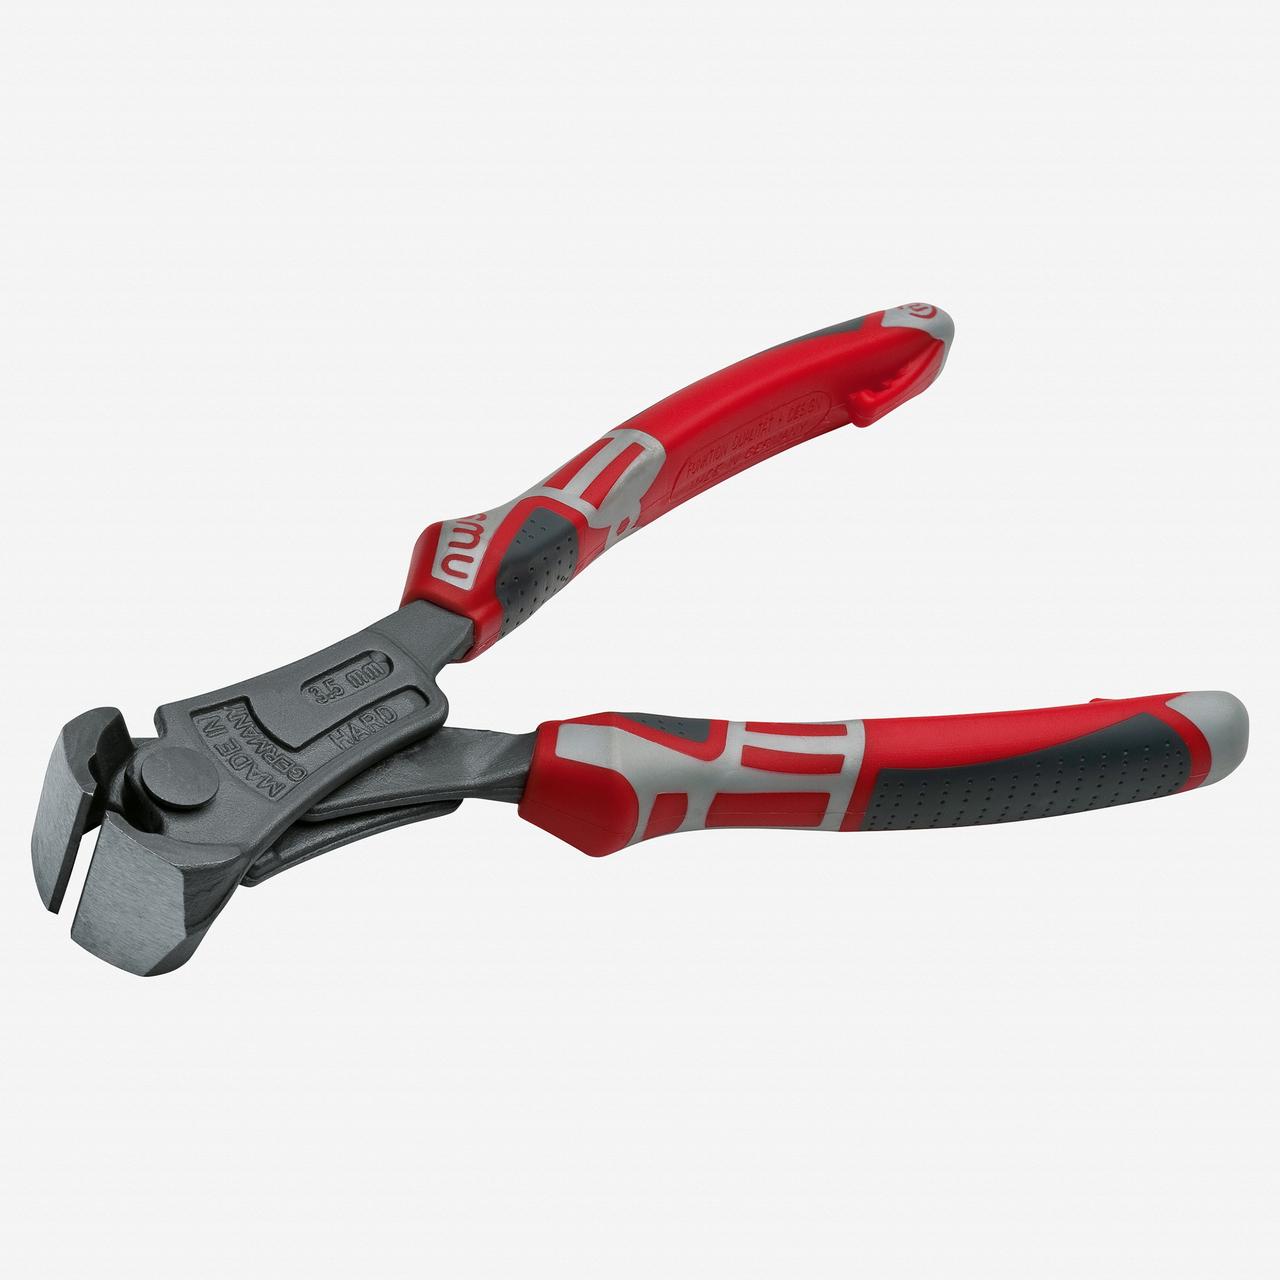 "NWS 1311-69-200 8"" Heavy Duty Lever End Cutting Nipper PowerBolt - TitanFinish - SoftGripp - KC Tool"